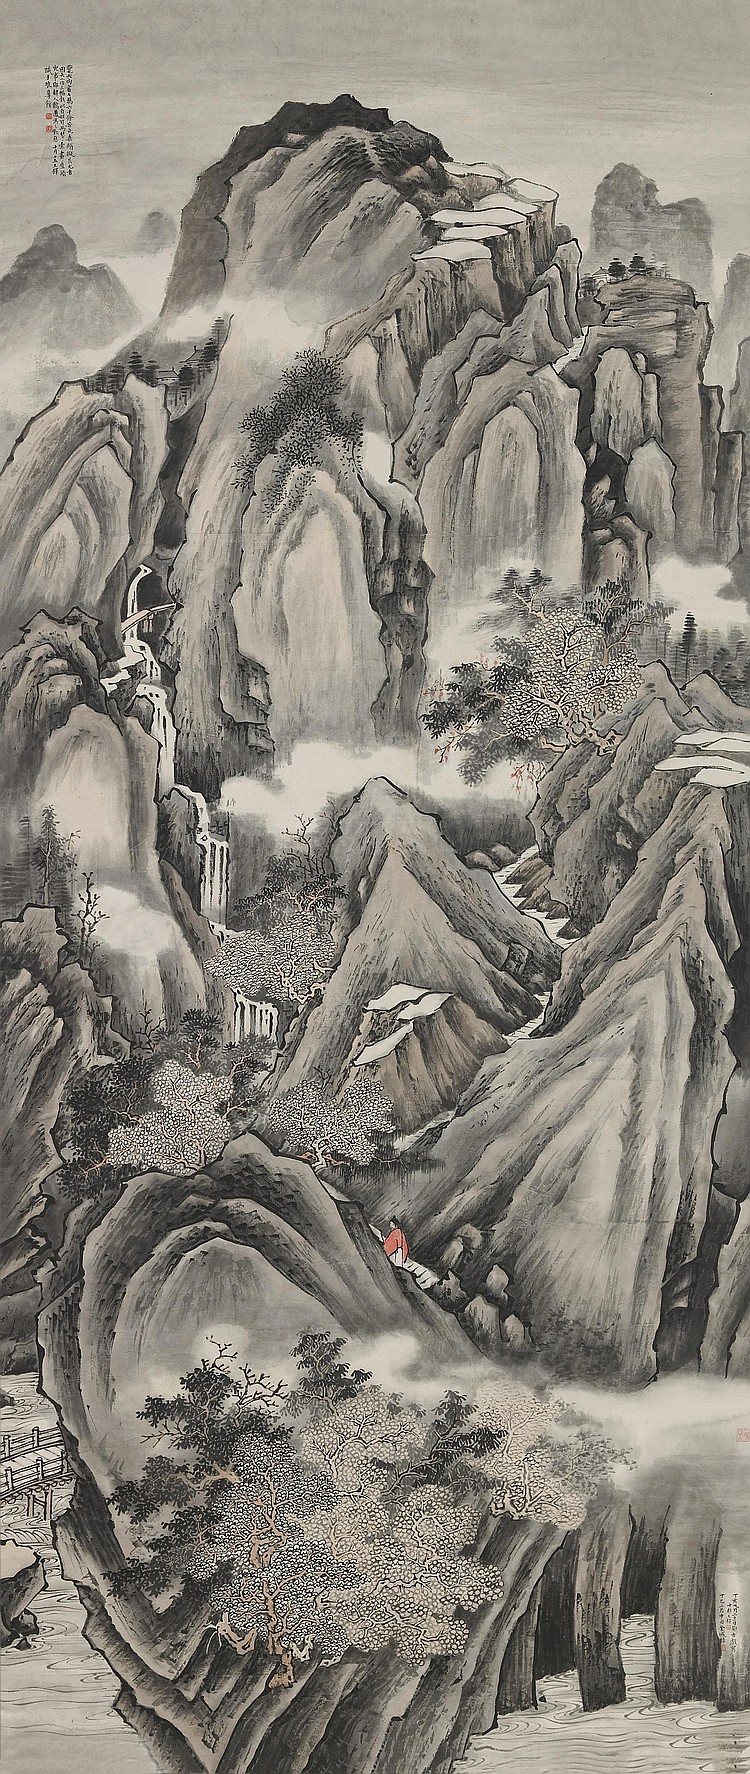 JIN CHENG (1878-1926)